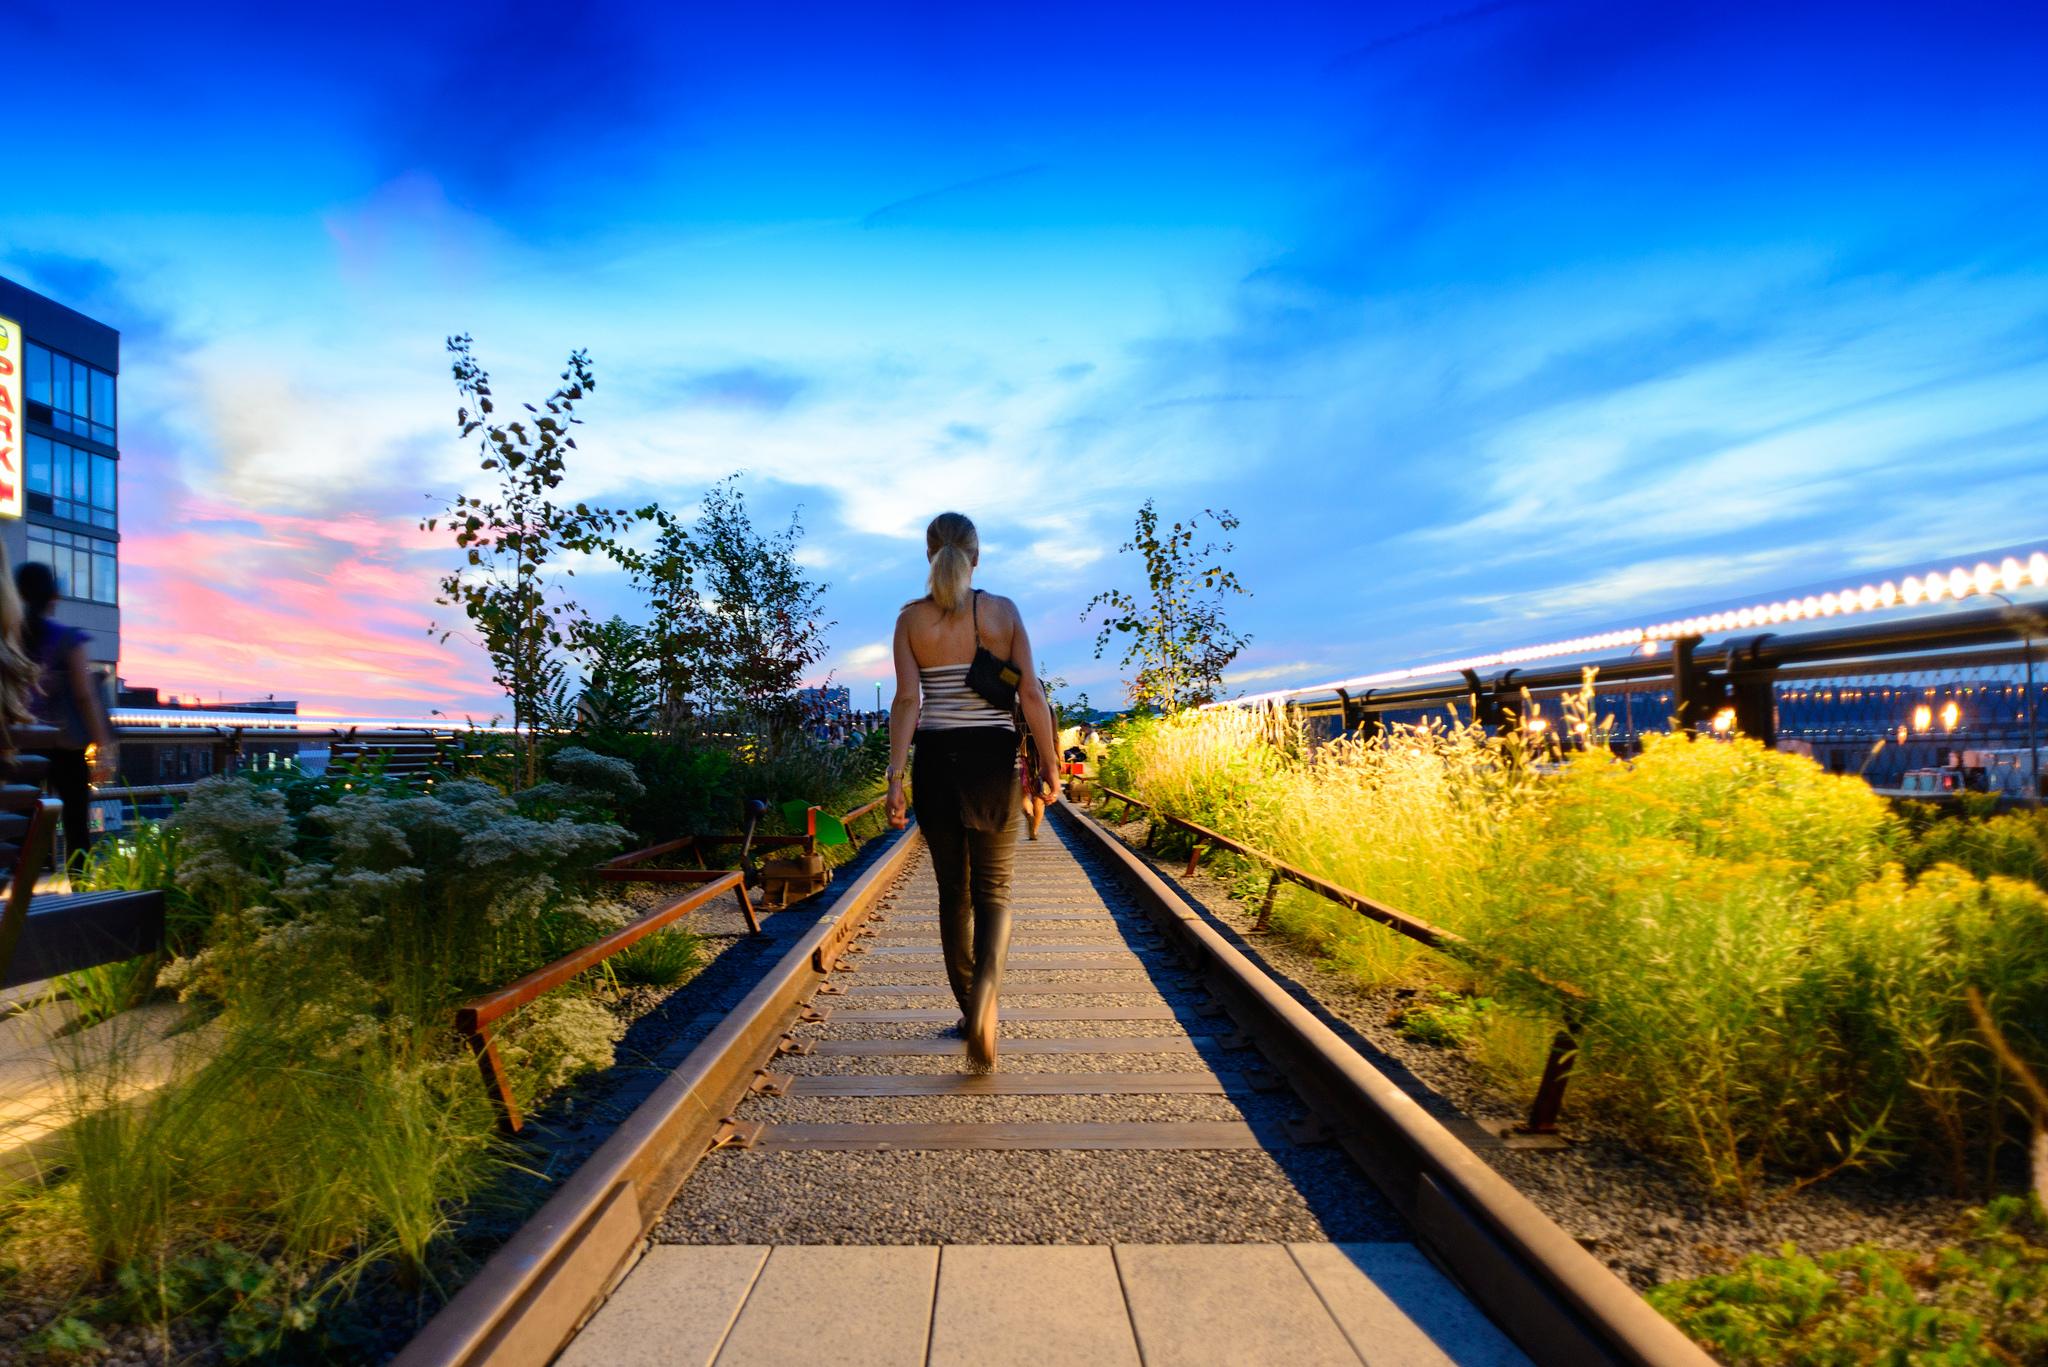 Walking the High Line at Sunset | © Ashu Mathura/Flickr